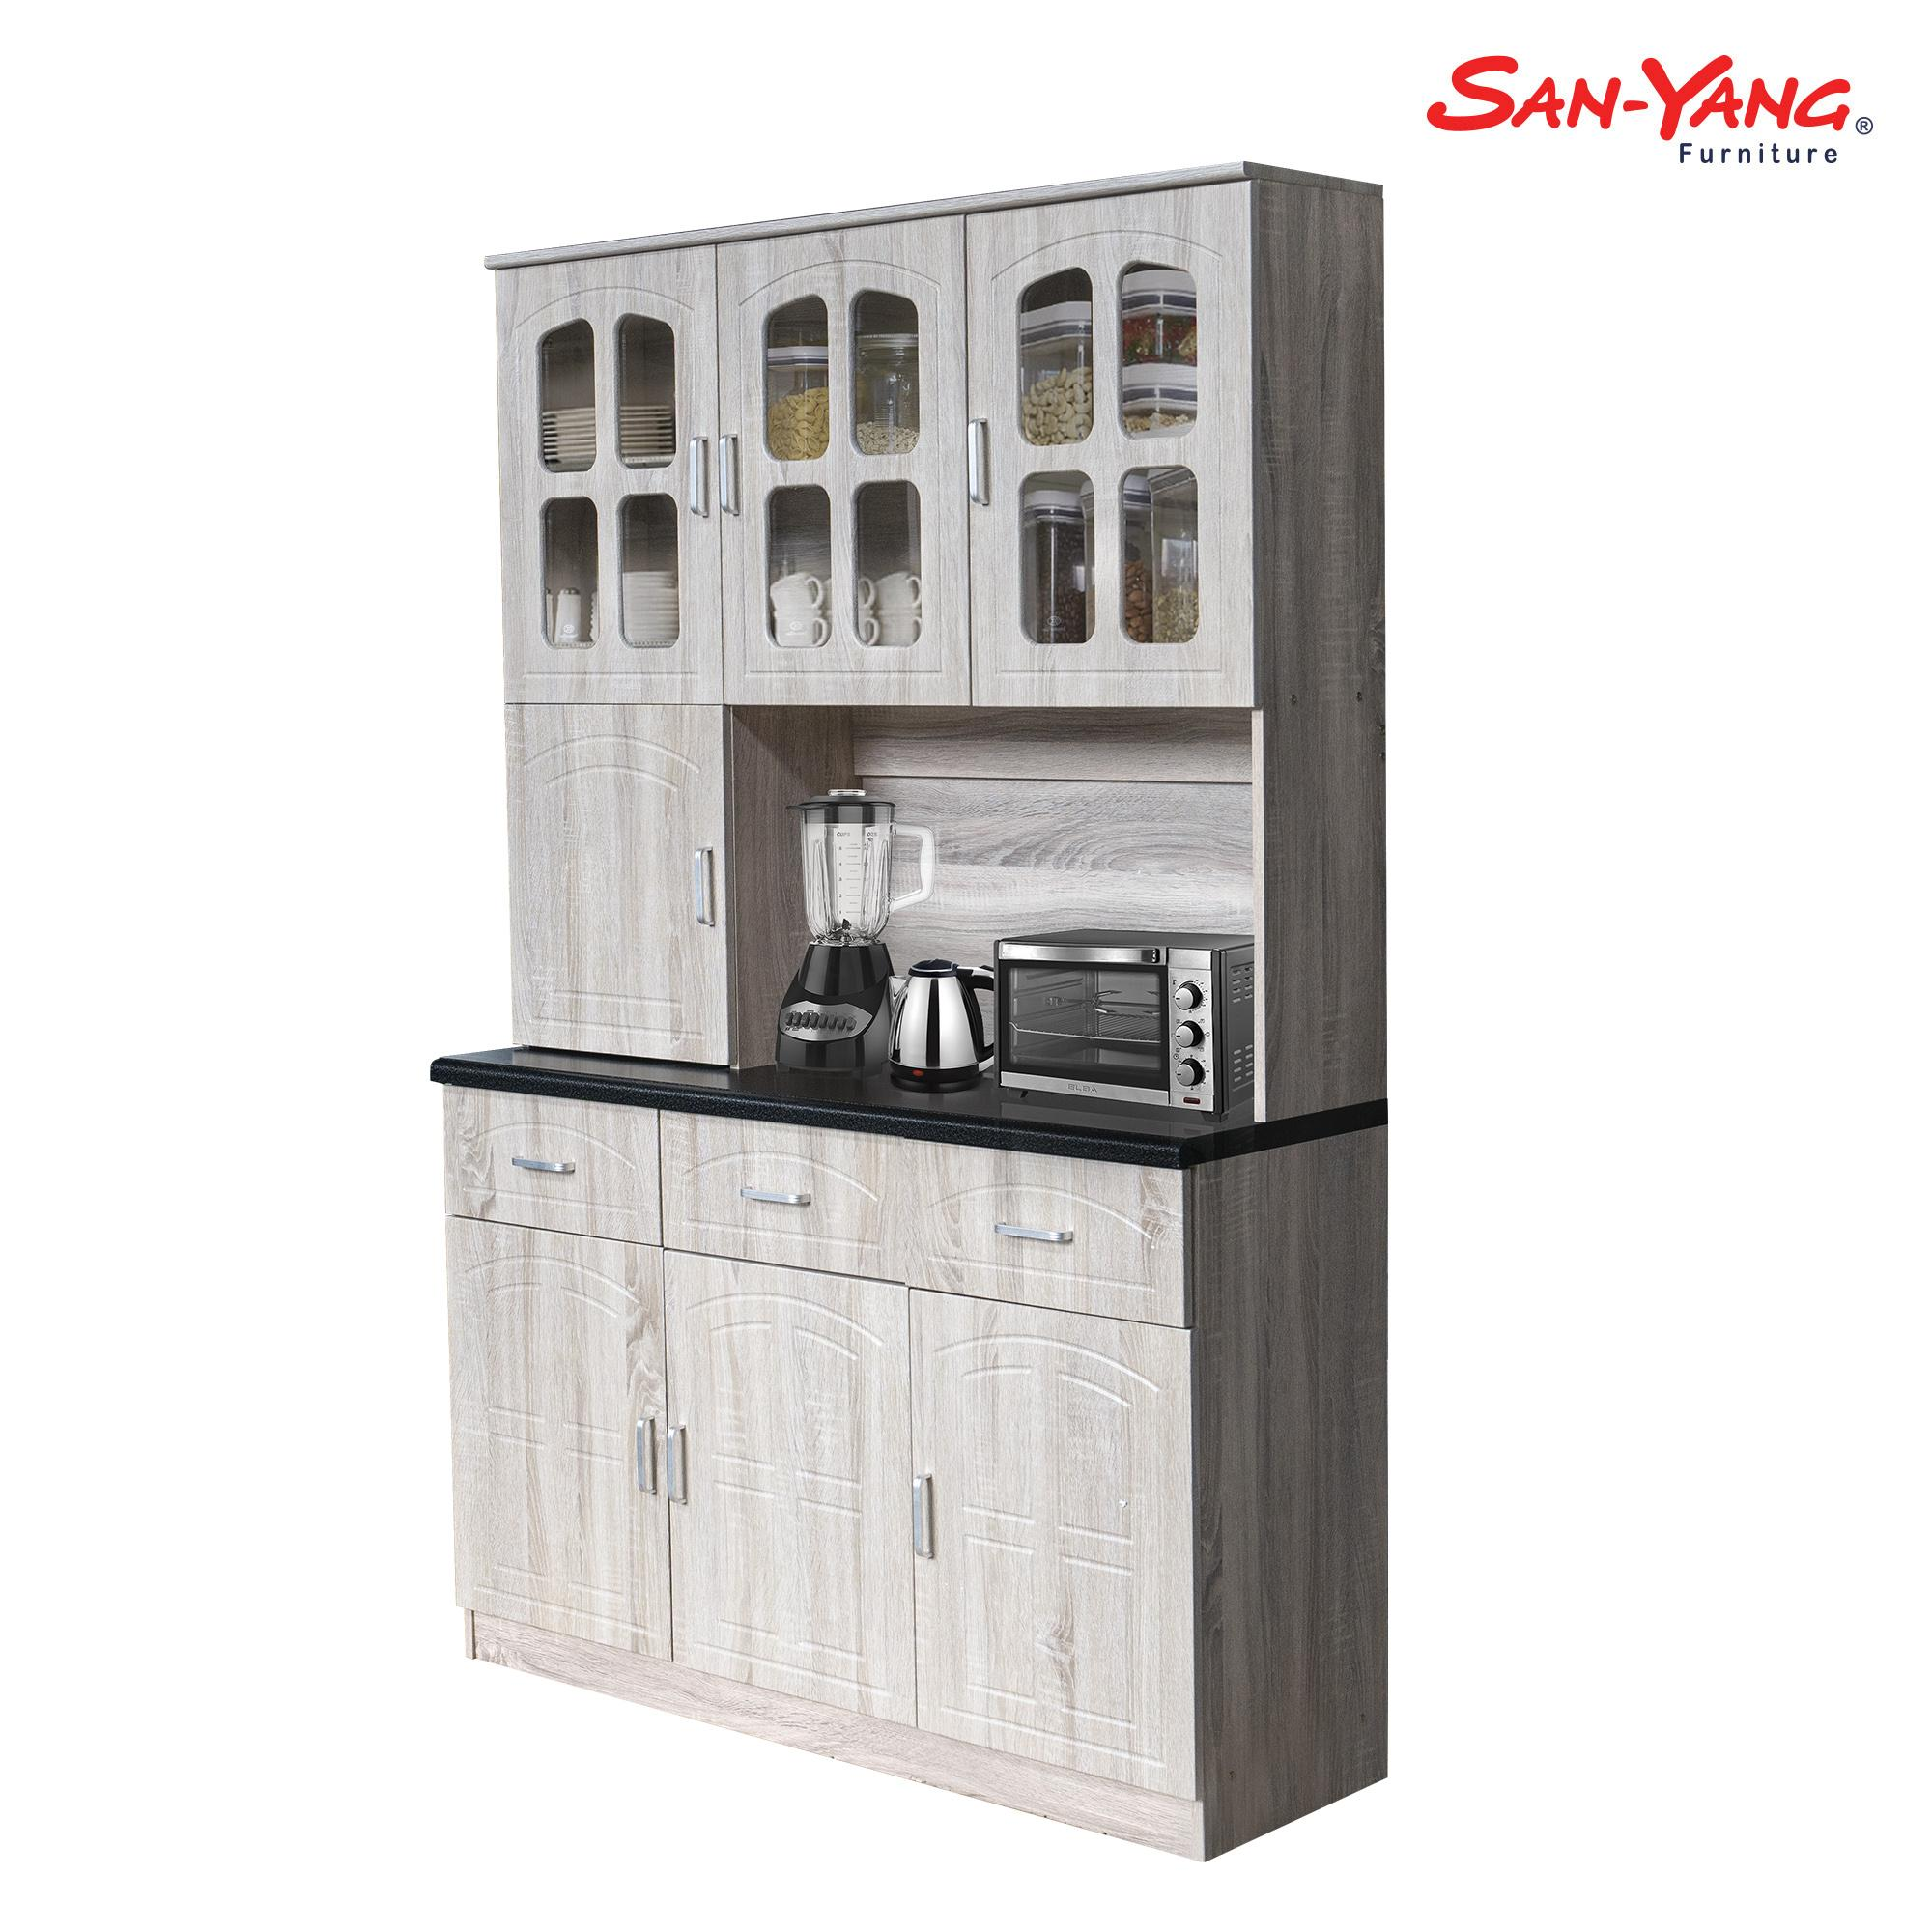 Kitchen Cabinets Sets For Sale: Kitchen Furniture For Sale